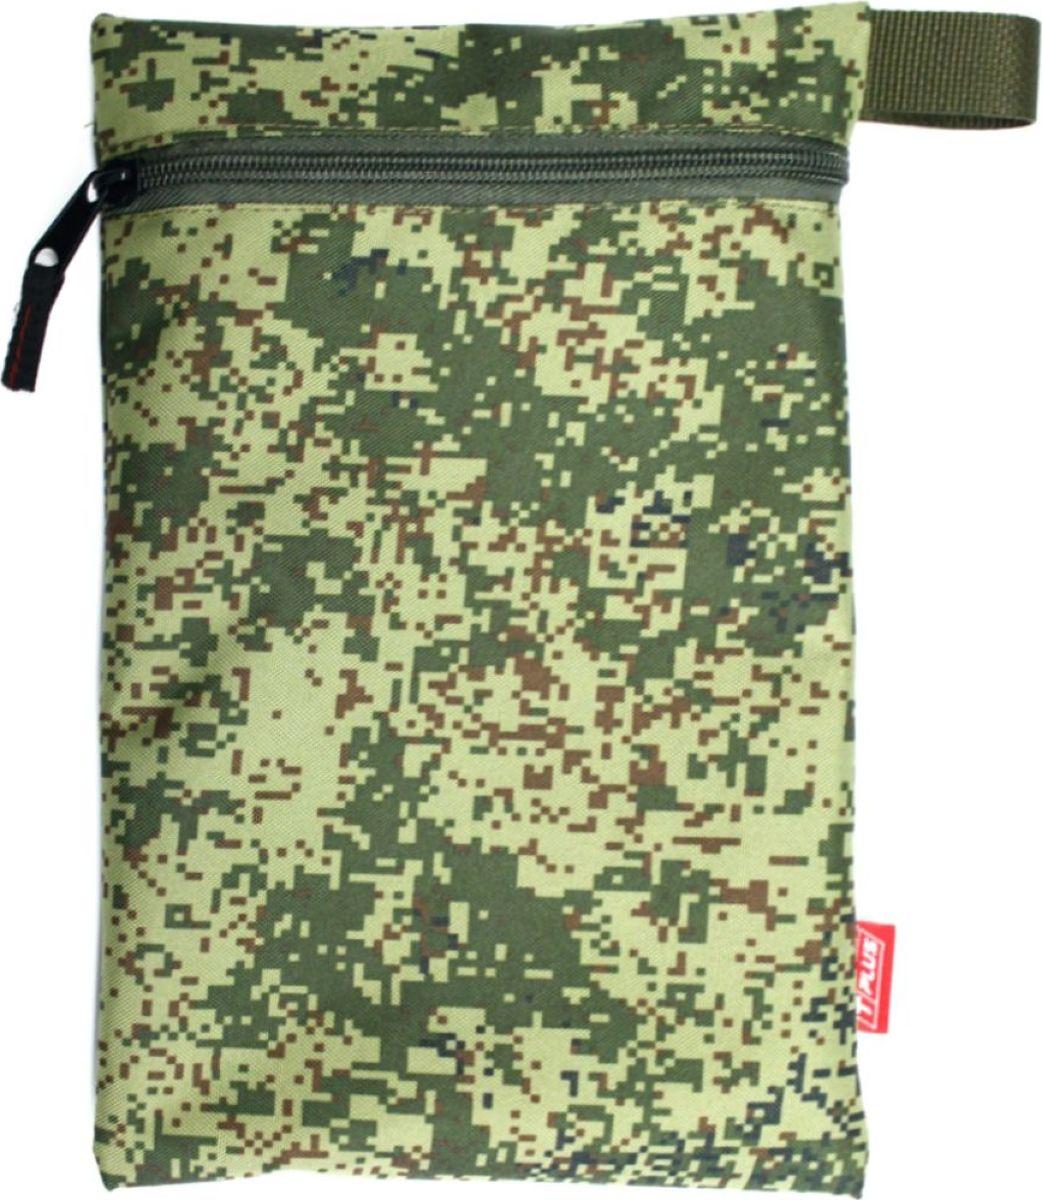 Мешок вещевой Tplus 600, цвет: цифра, 20 x 31 см сумка рыбака tplus 600 цвет цифра 40 x 22 x 24 см